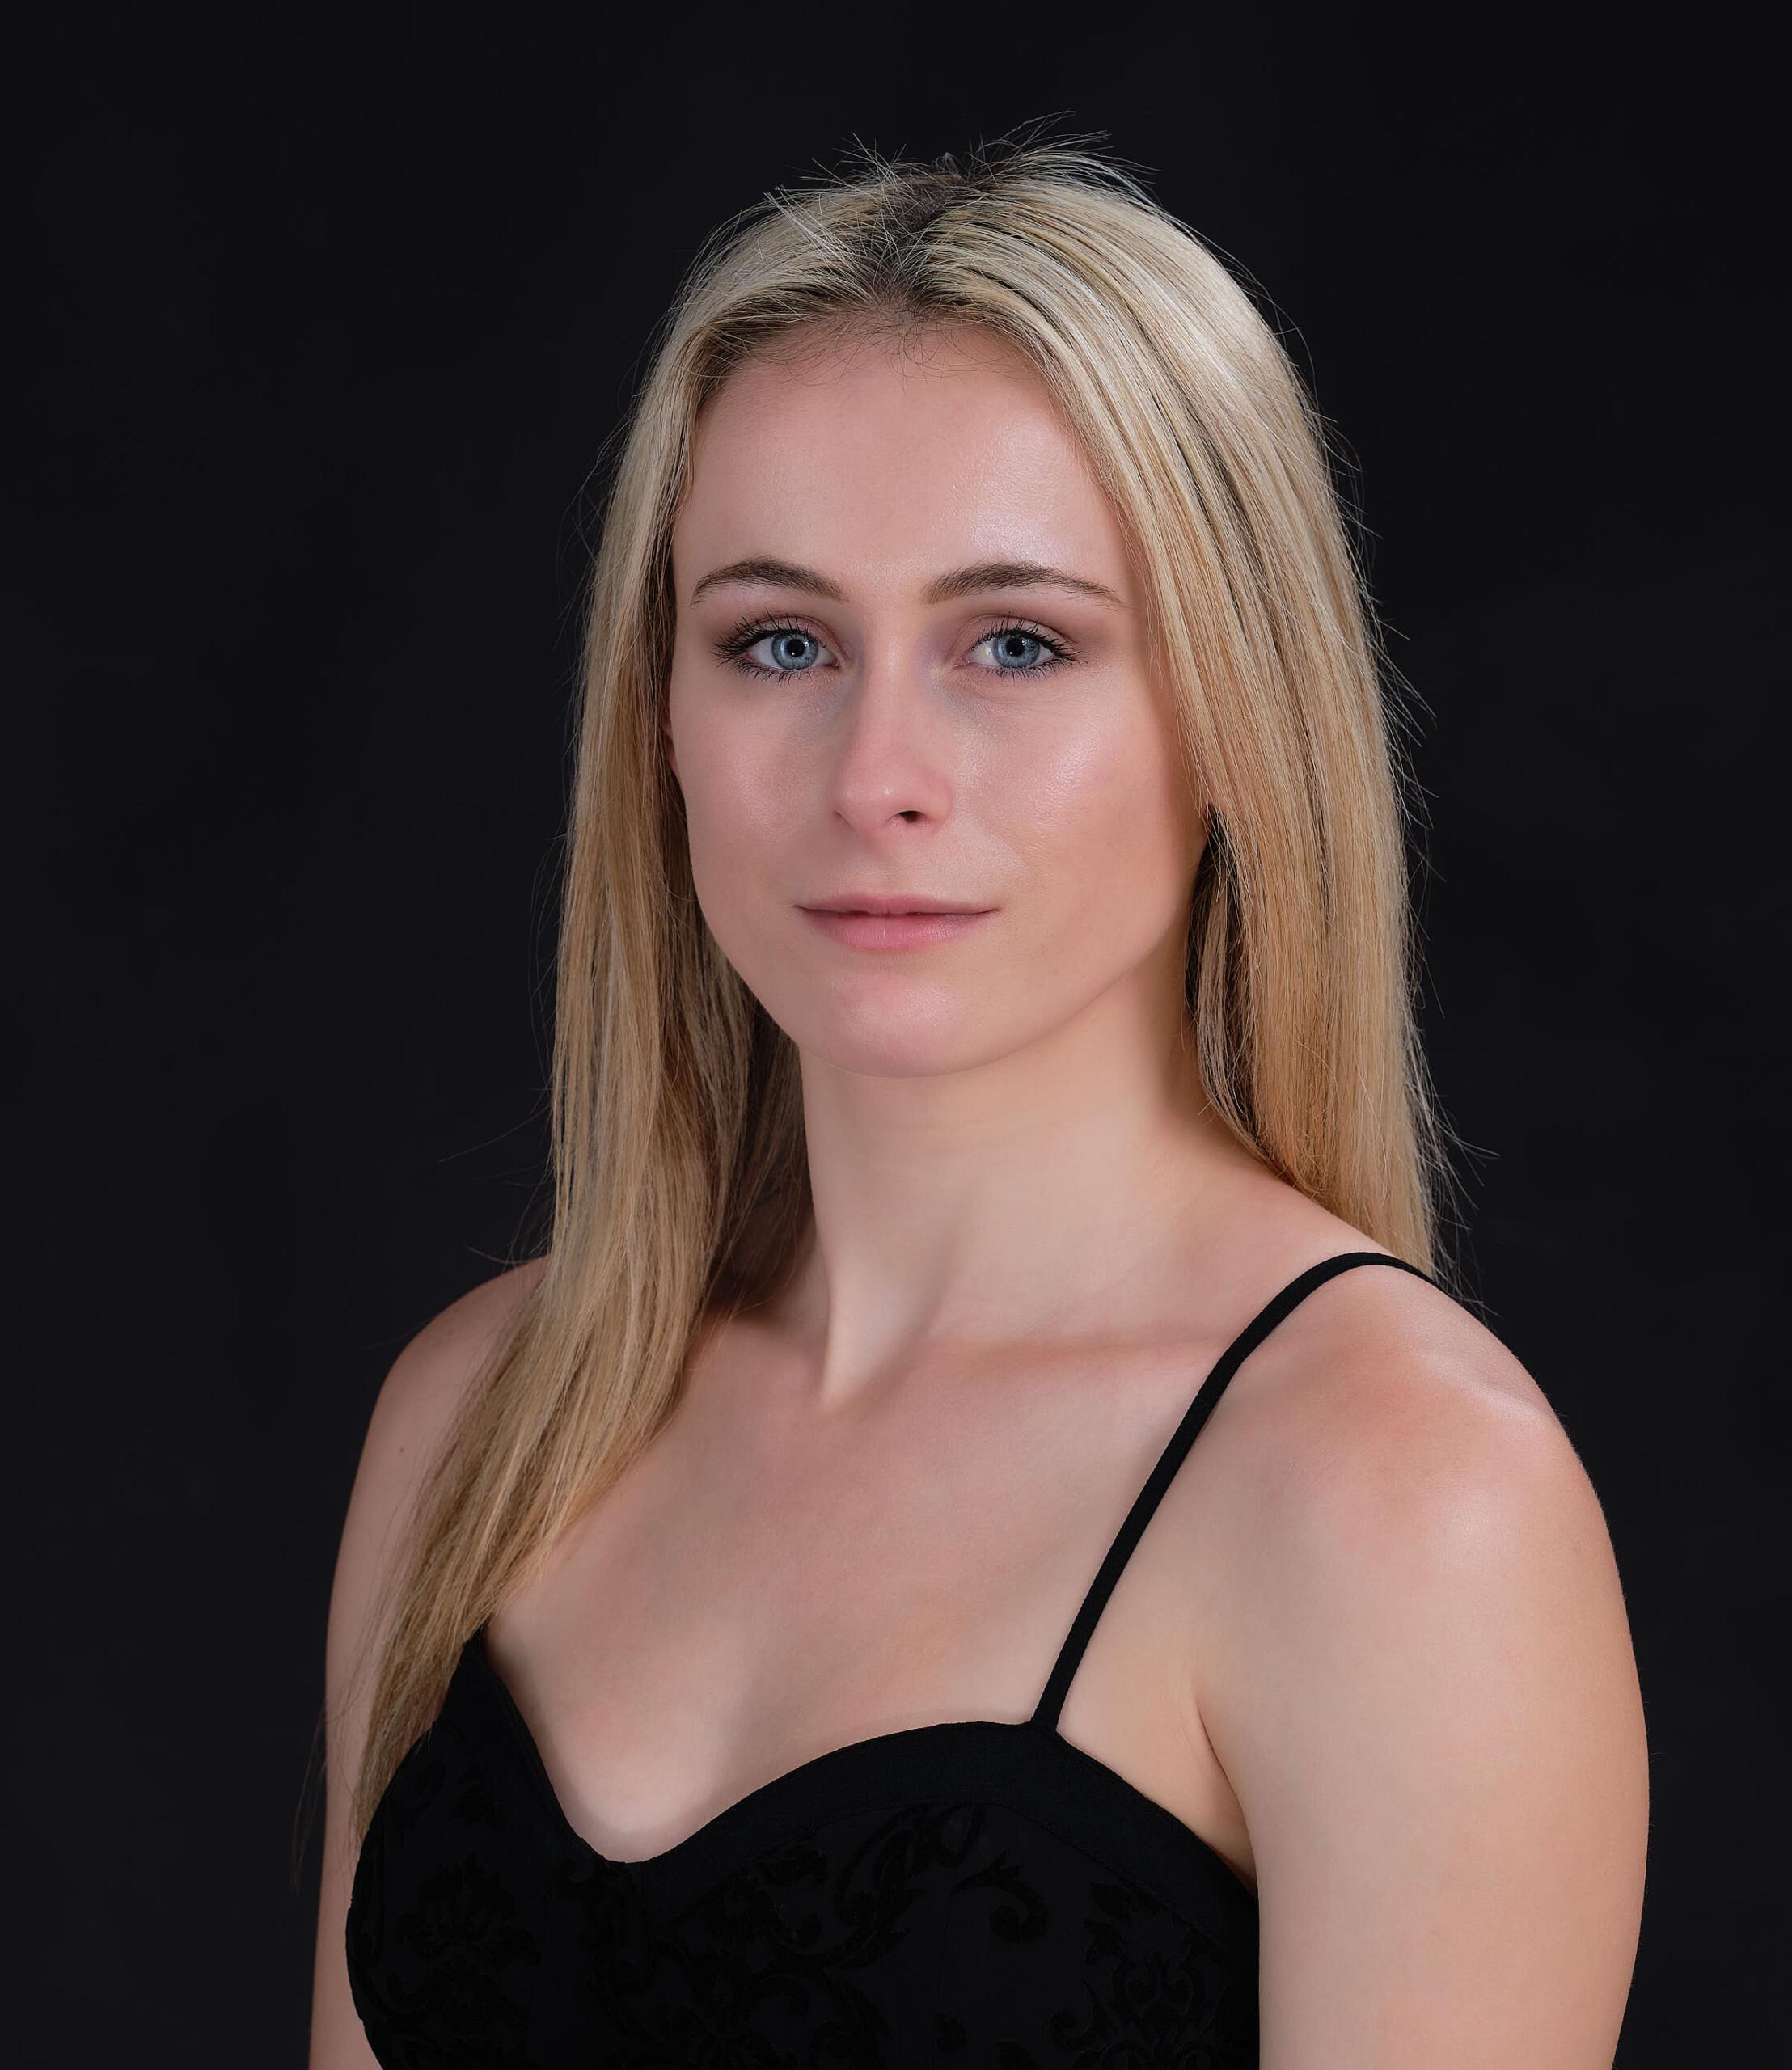 Alyson King 2 -Corporate Portrait Photography